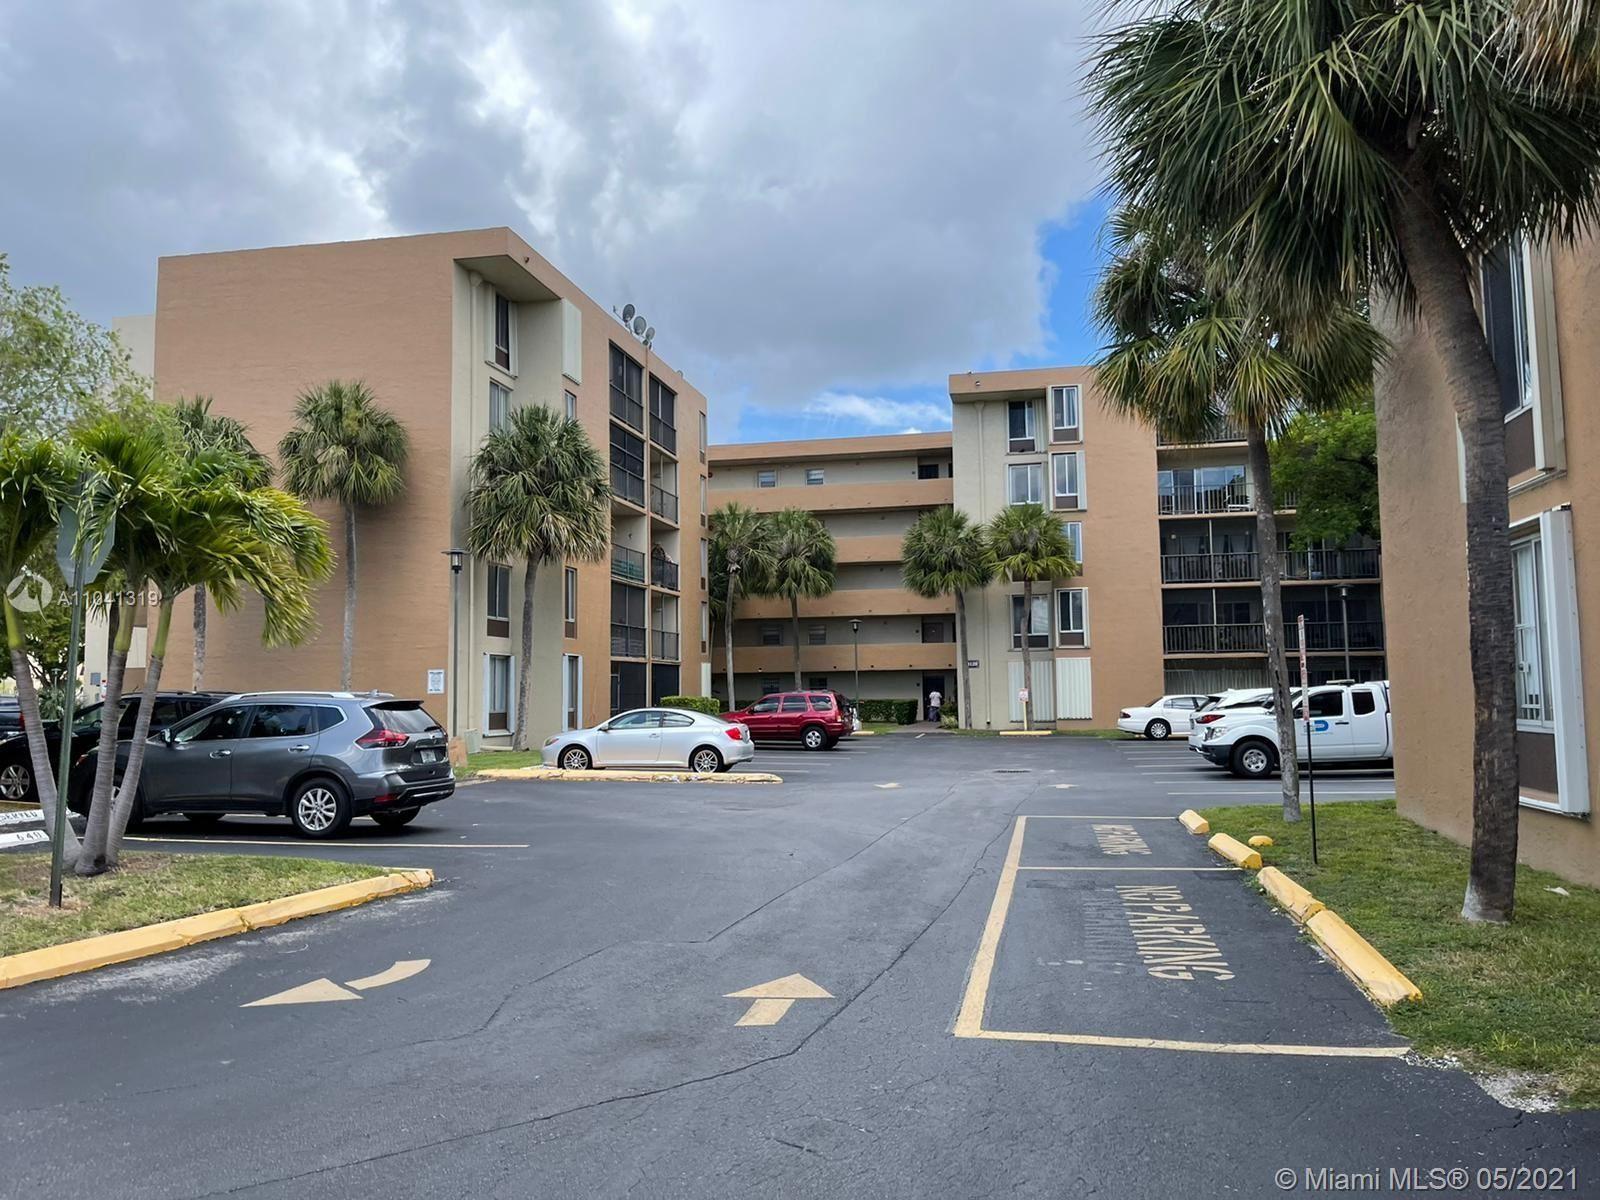 9120 Fontainebleau Blvd #107, Miami, FL 33172 - #: A11041319